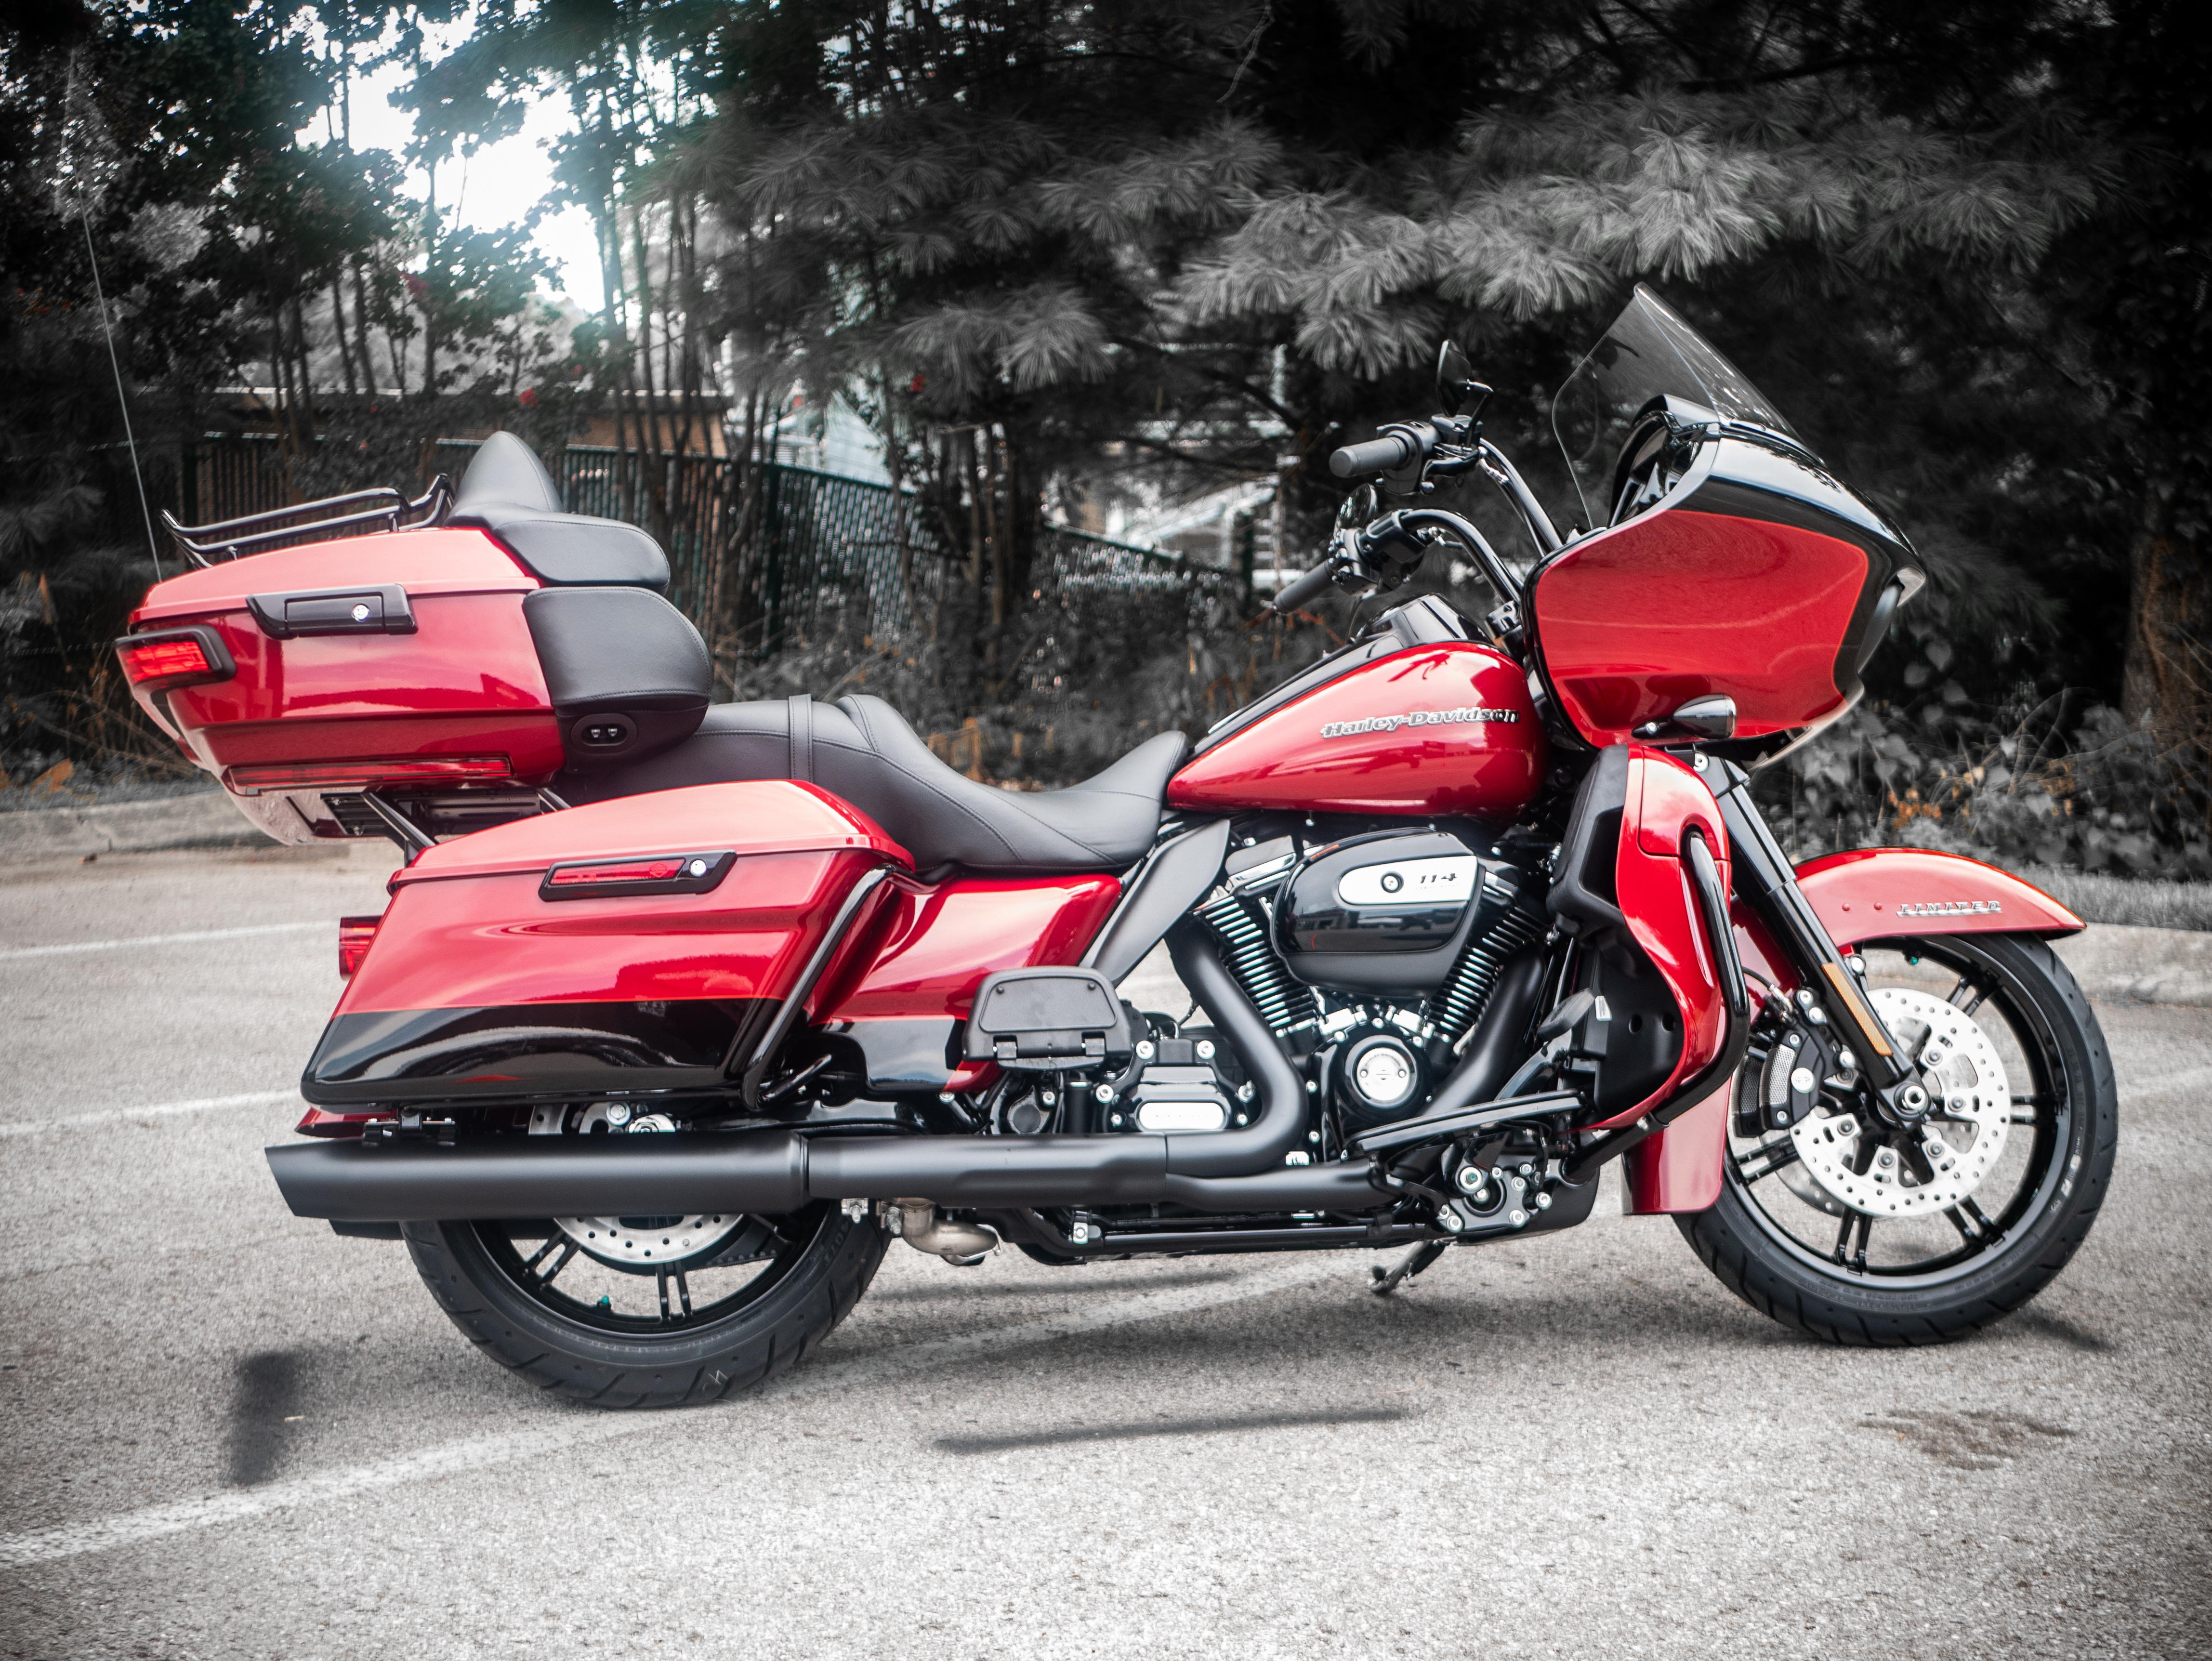 New 2020 Harley-Davidson Road Glide Limited in Franklin ...